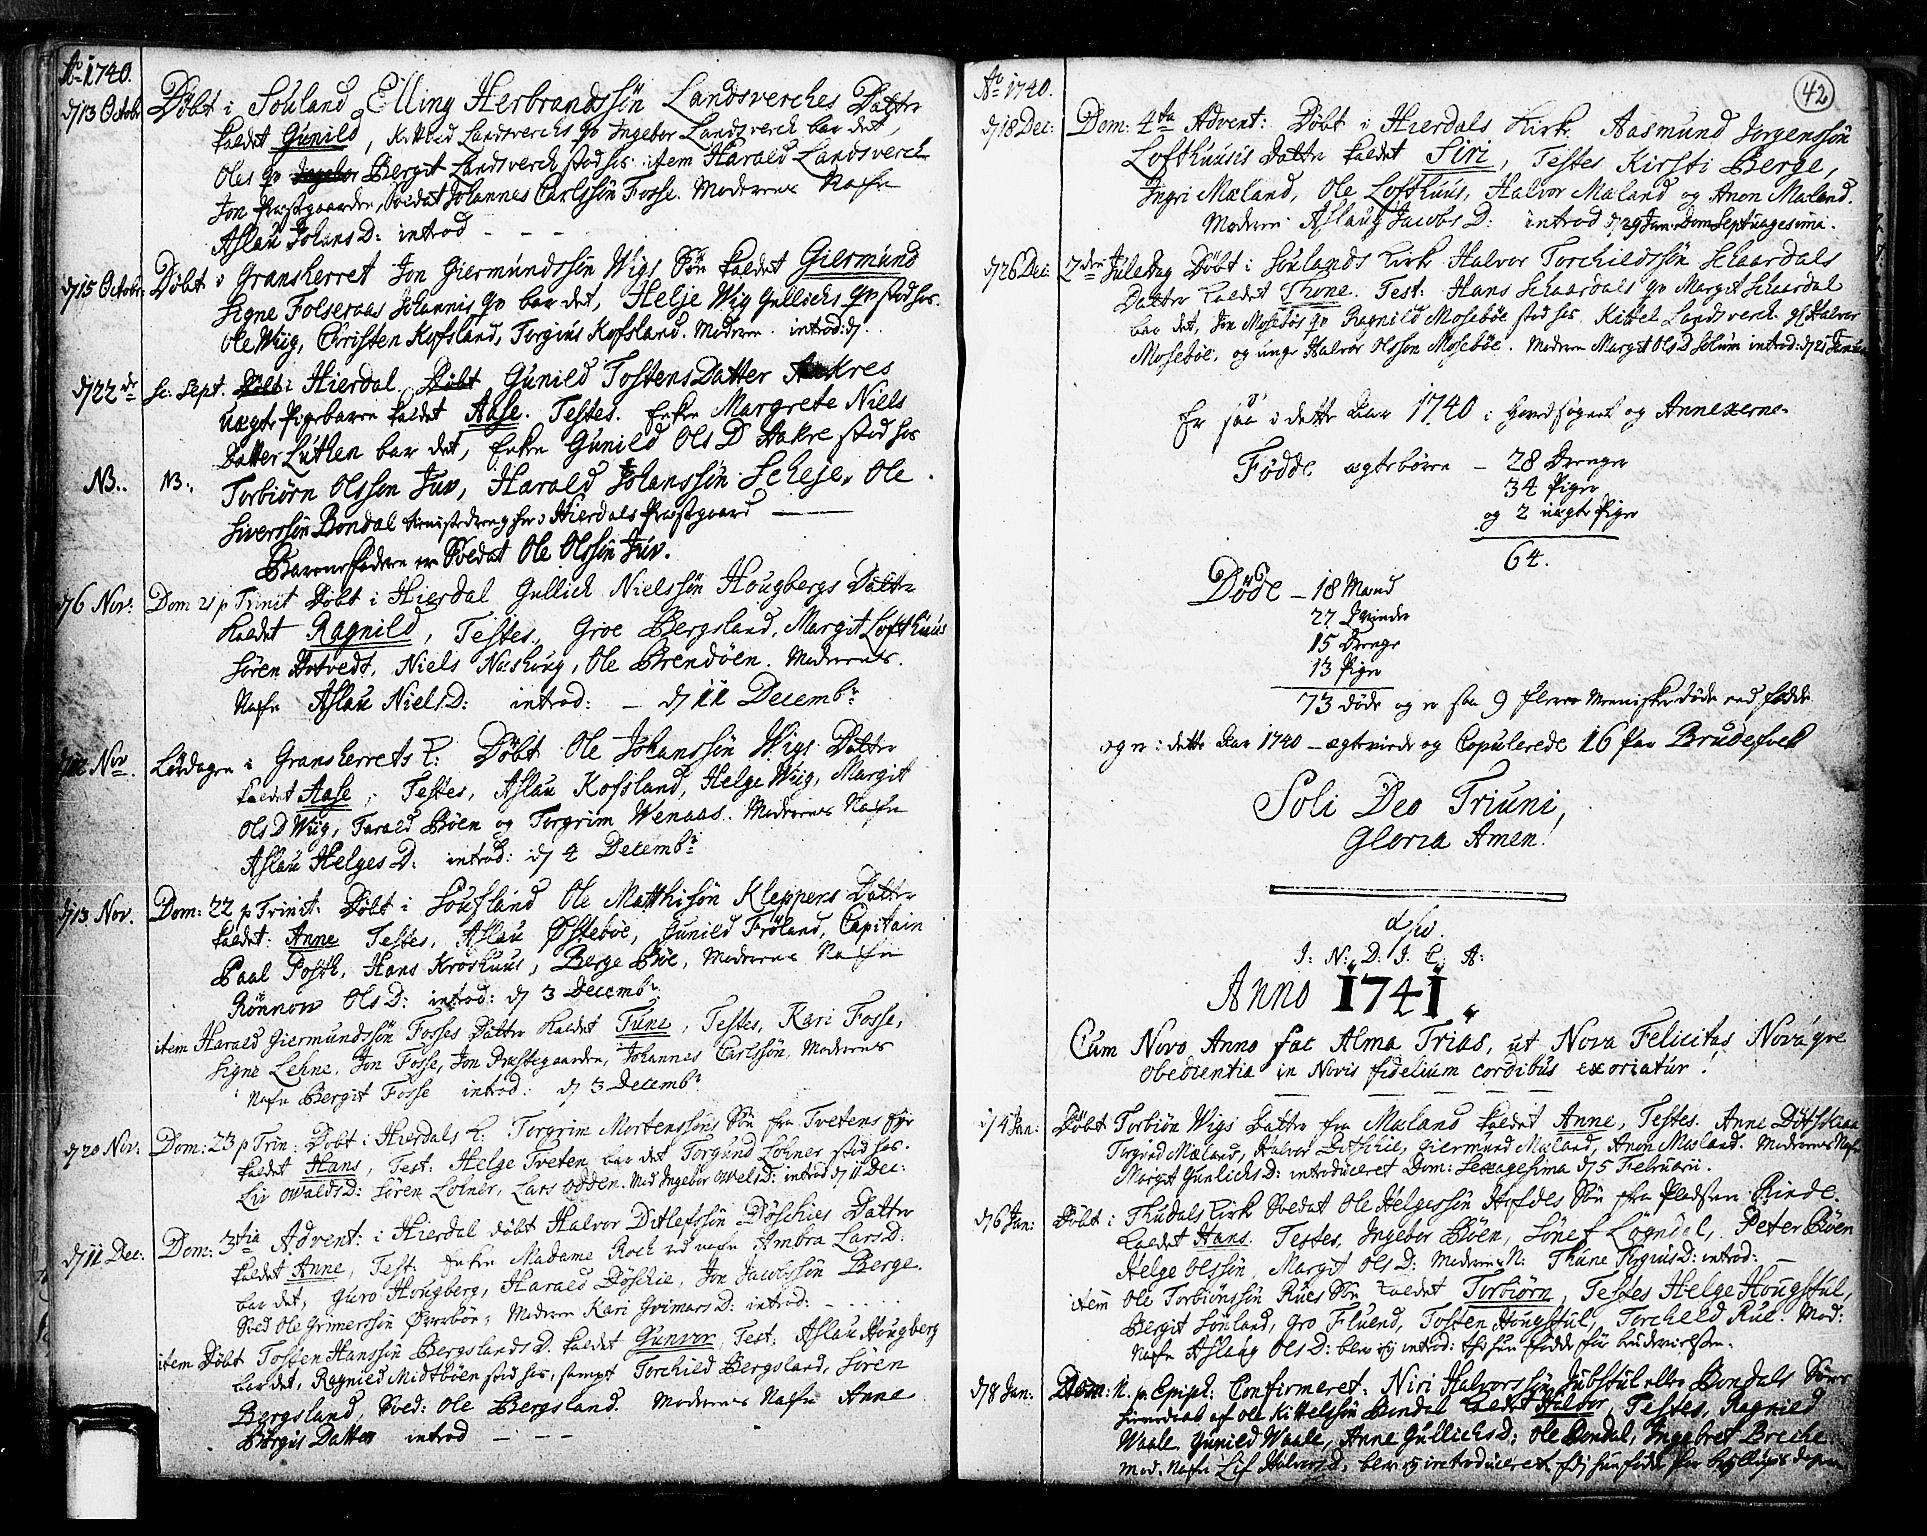 SAKO, Hjartdal kirkebøker, F/Fa/L0003: Ministerialbok nr. I 3, 1727-1775, s. 42